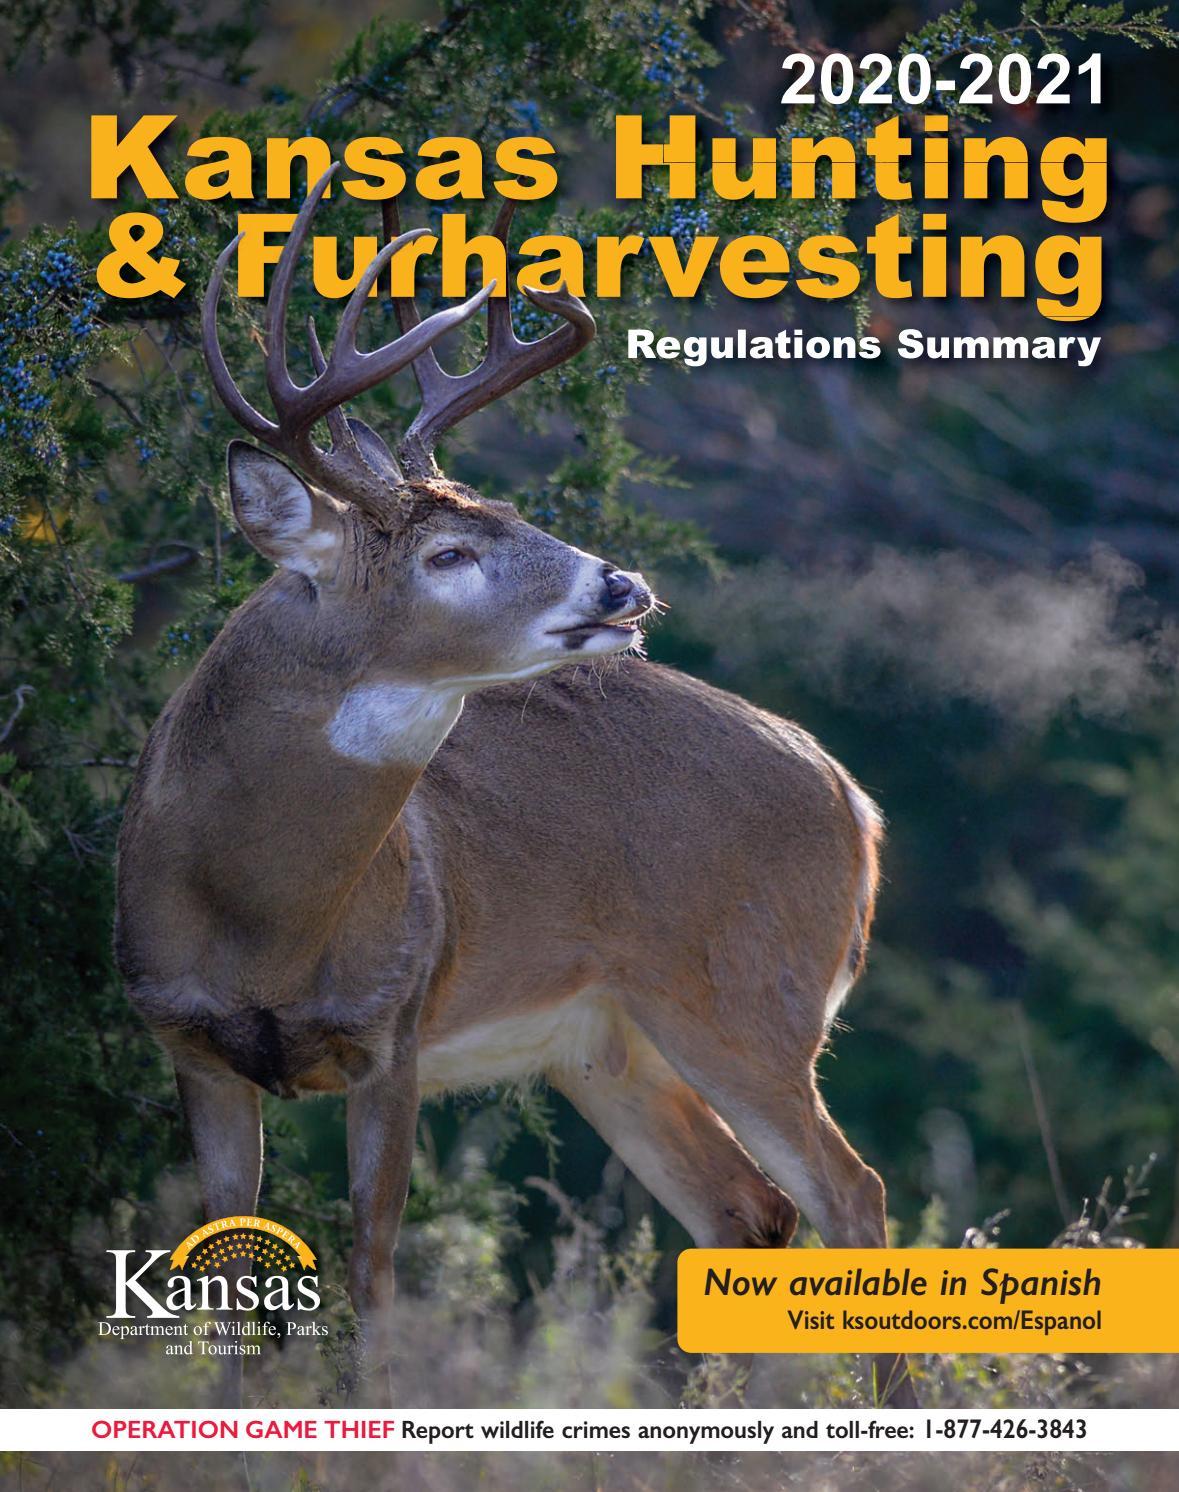 2020-2021 Kansas Hunting & Furharvesting Regulations Summary intended for Whitetail Rut 2021